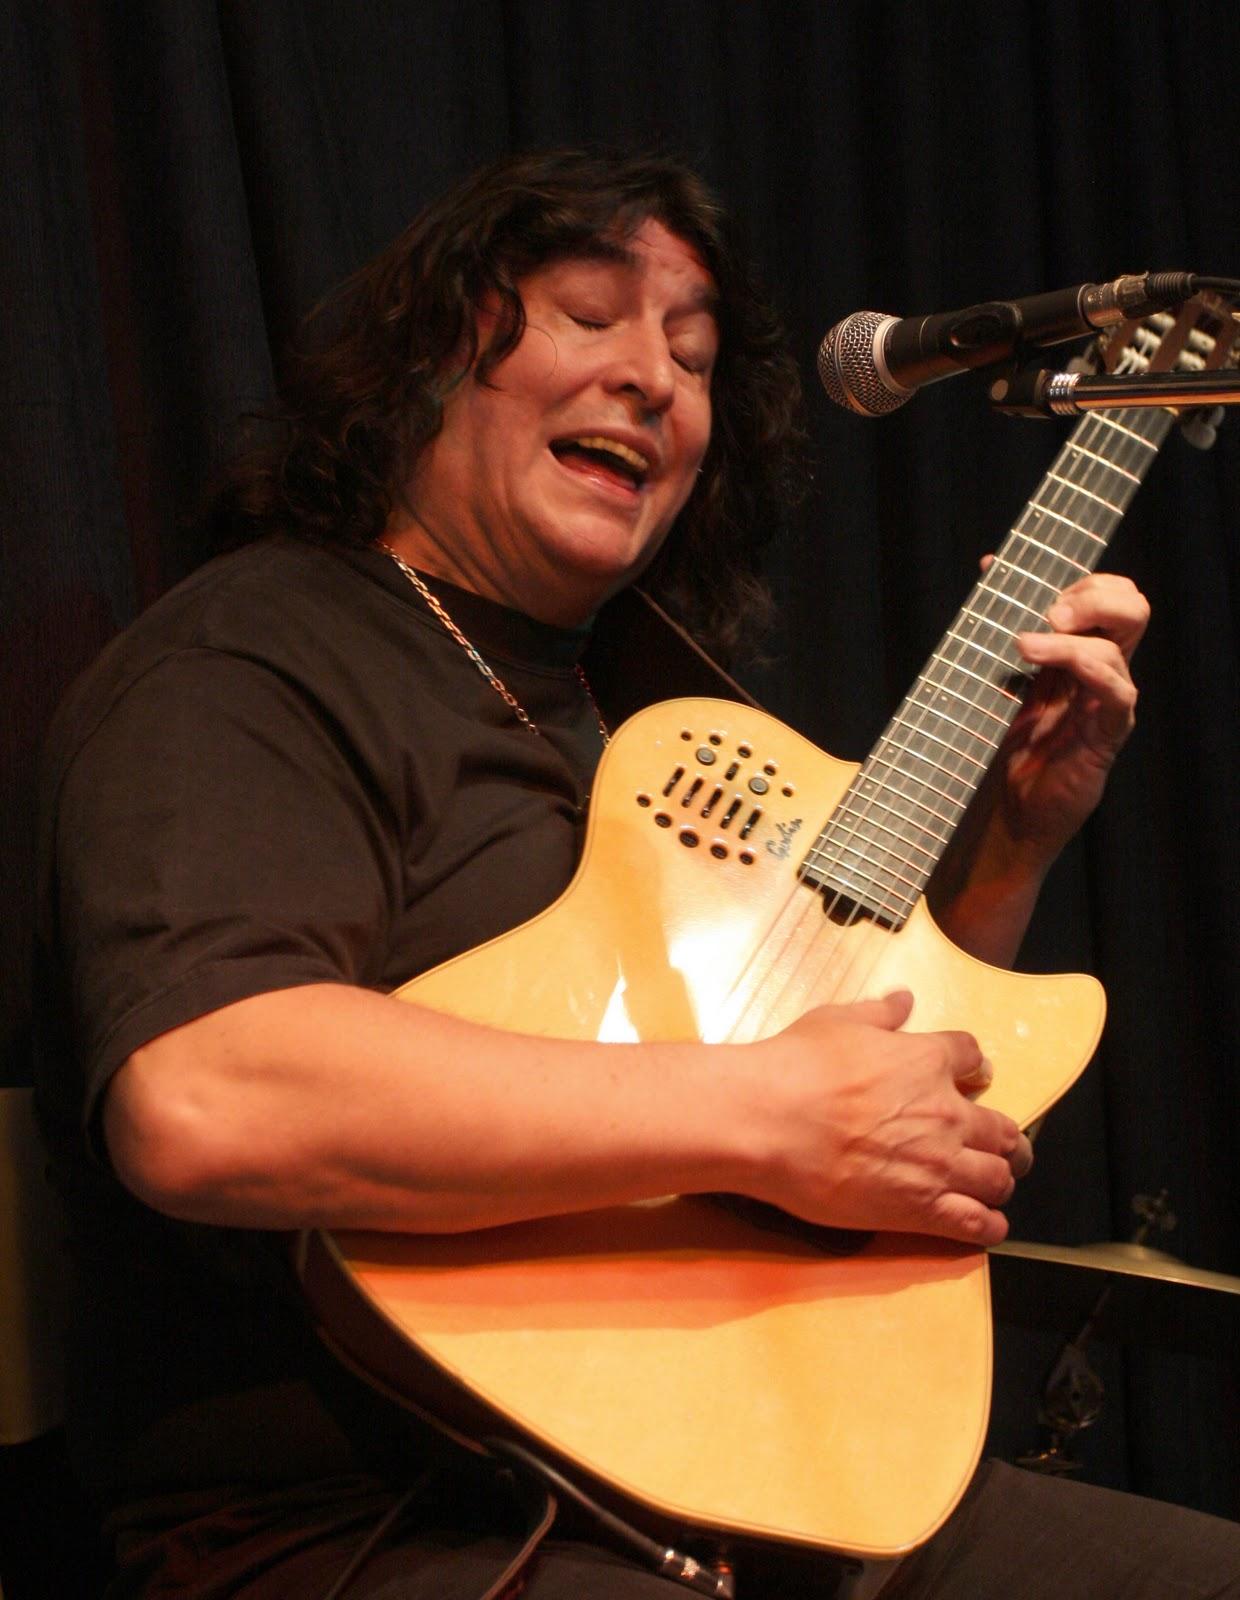 daniel fanego guitar